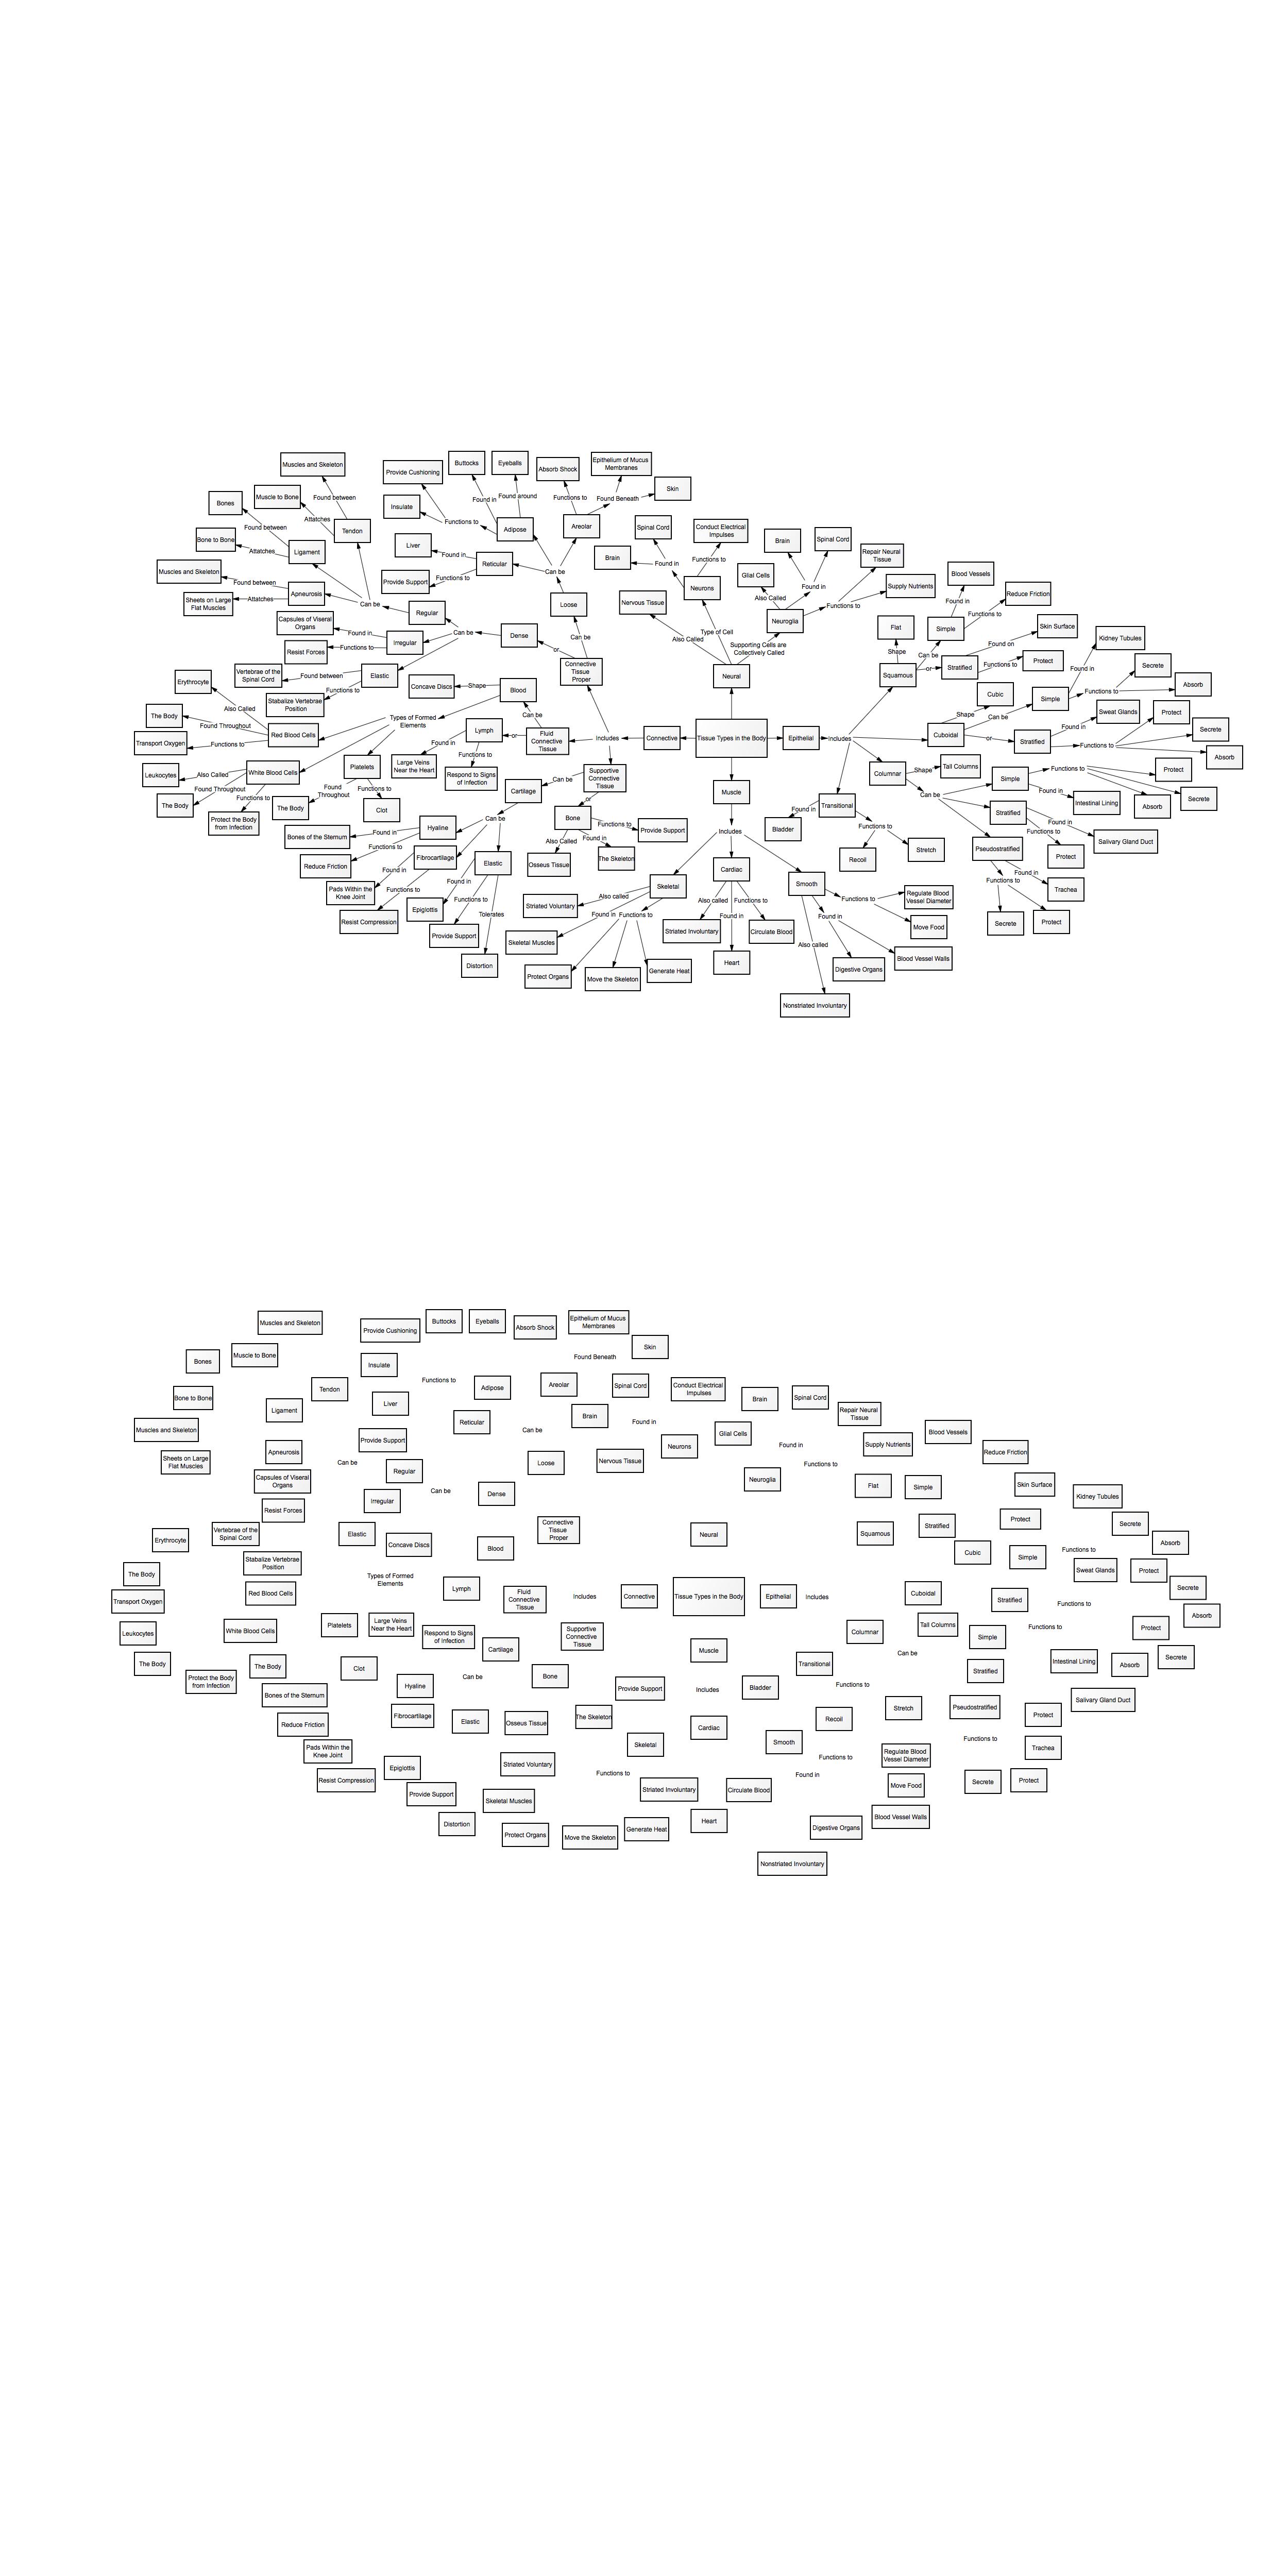 Anatomy Concept Map